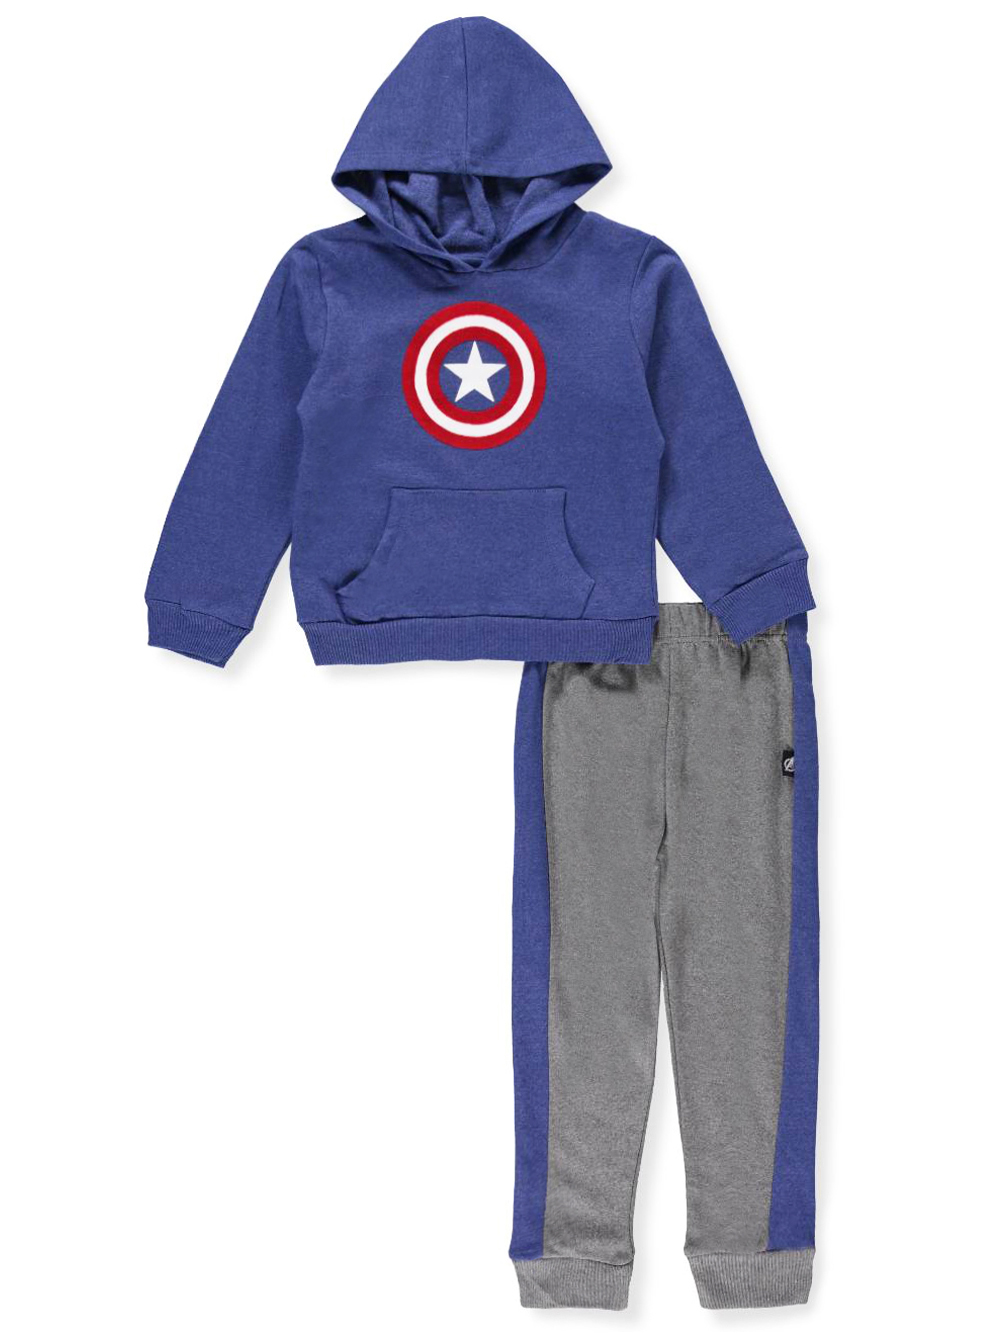 a4f795dae Disney Captain America Boys  2-Piece Pants Set Outfit